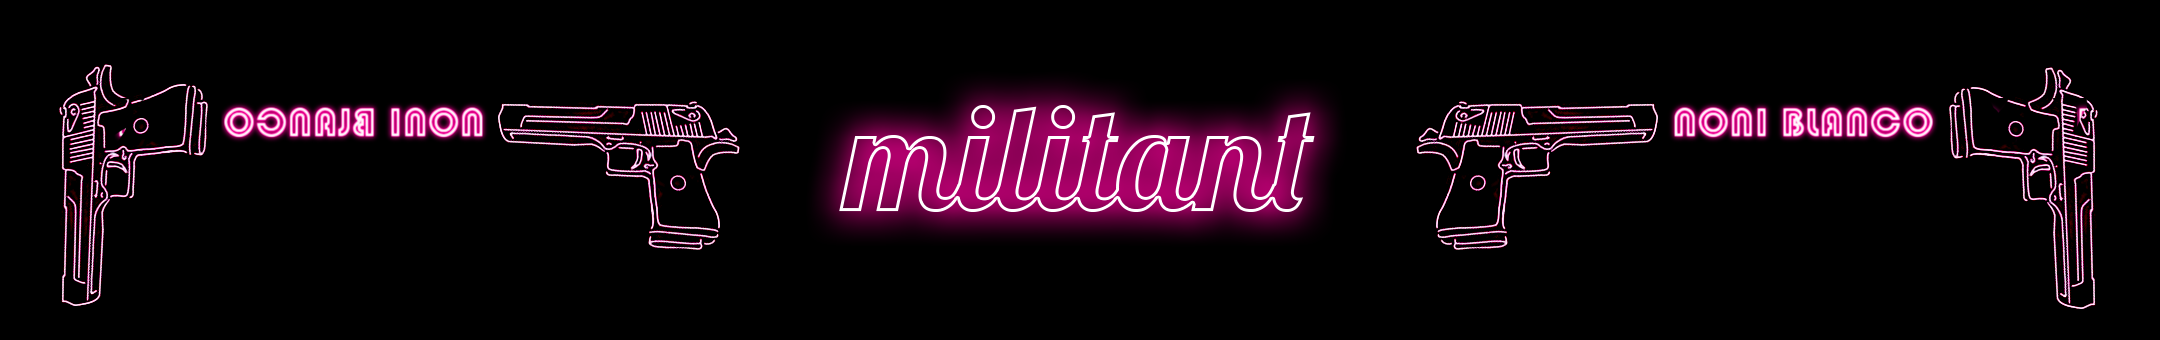 militant_top2.png